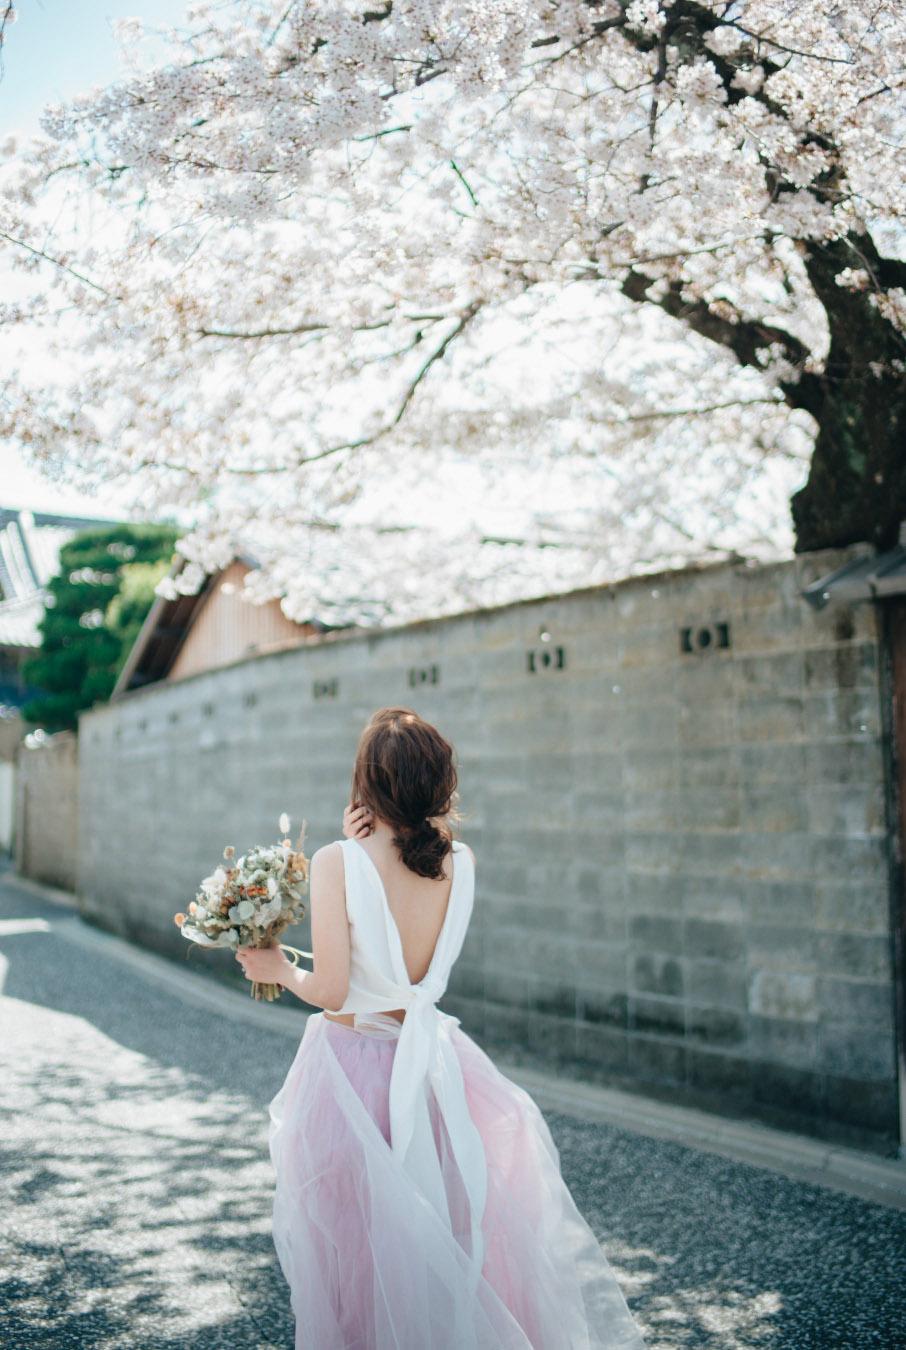 bride-in-pink wedding dress in japan-sakura